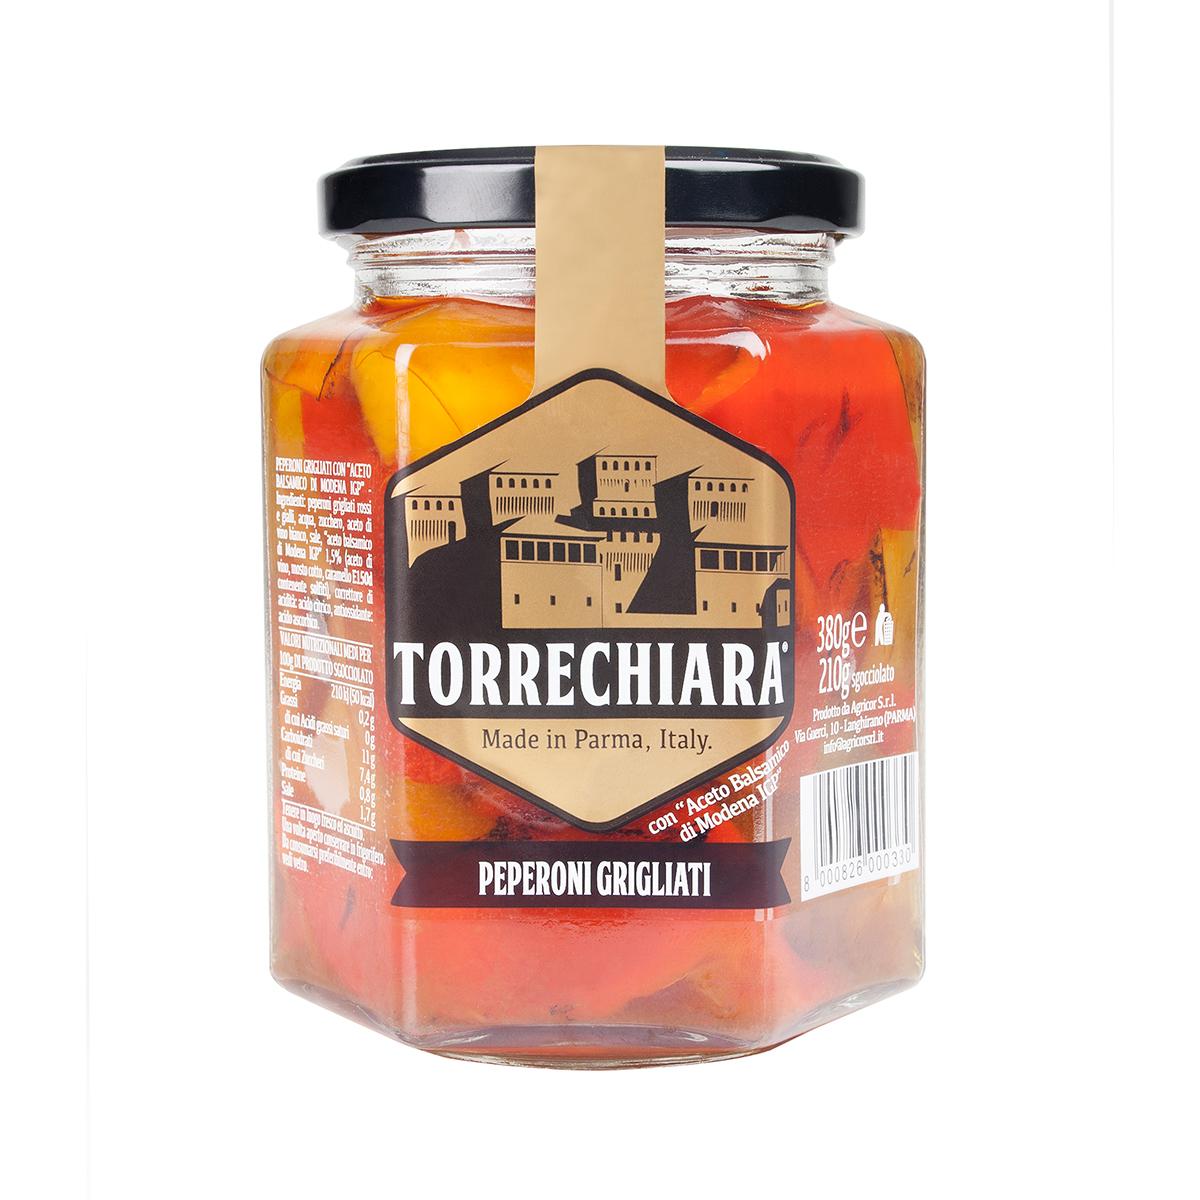 Peproni-grigliati-Torrechiara